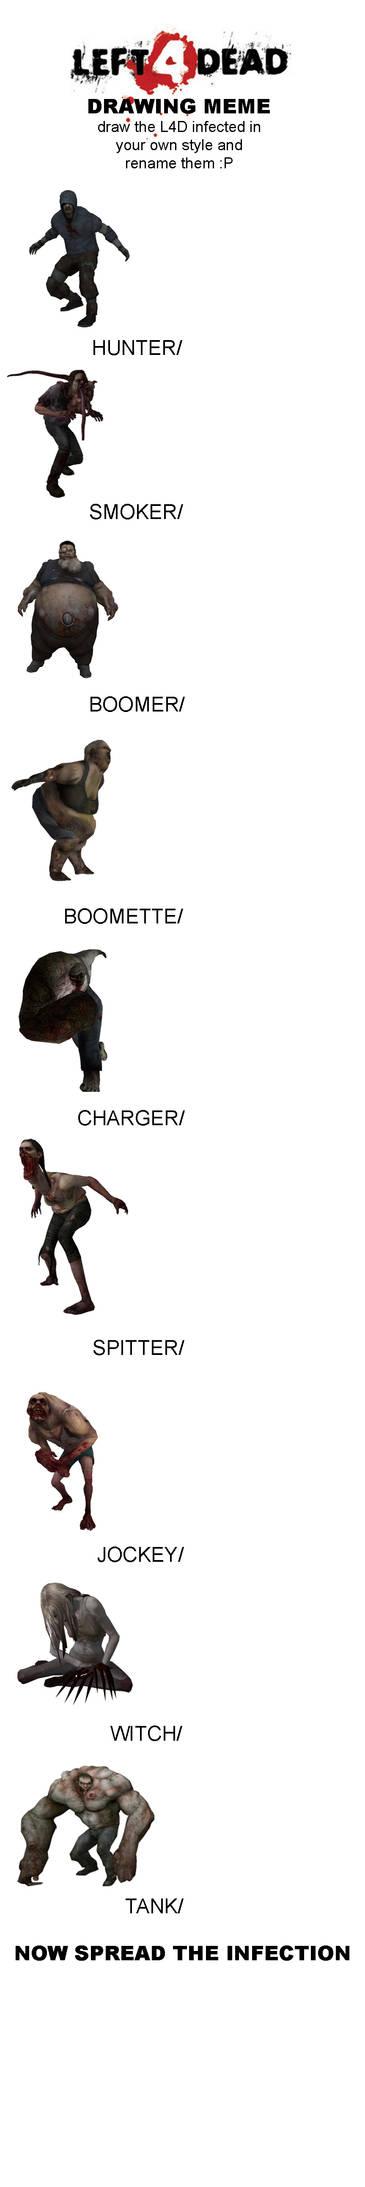 Left 4 Dead Infected Meme